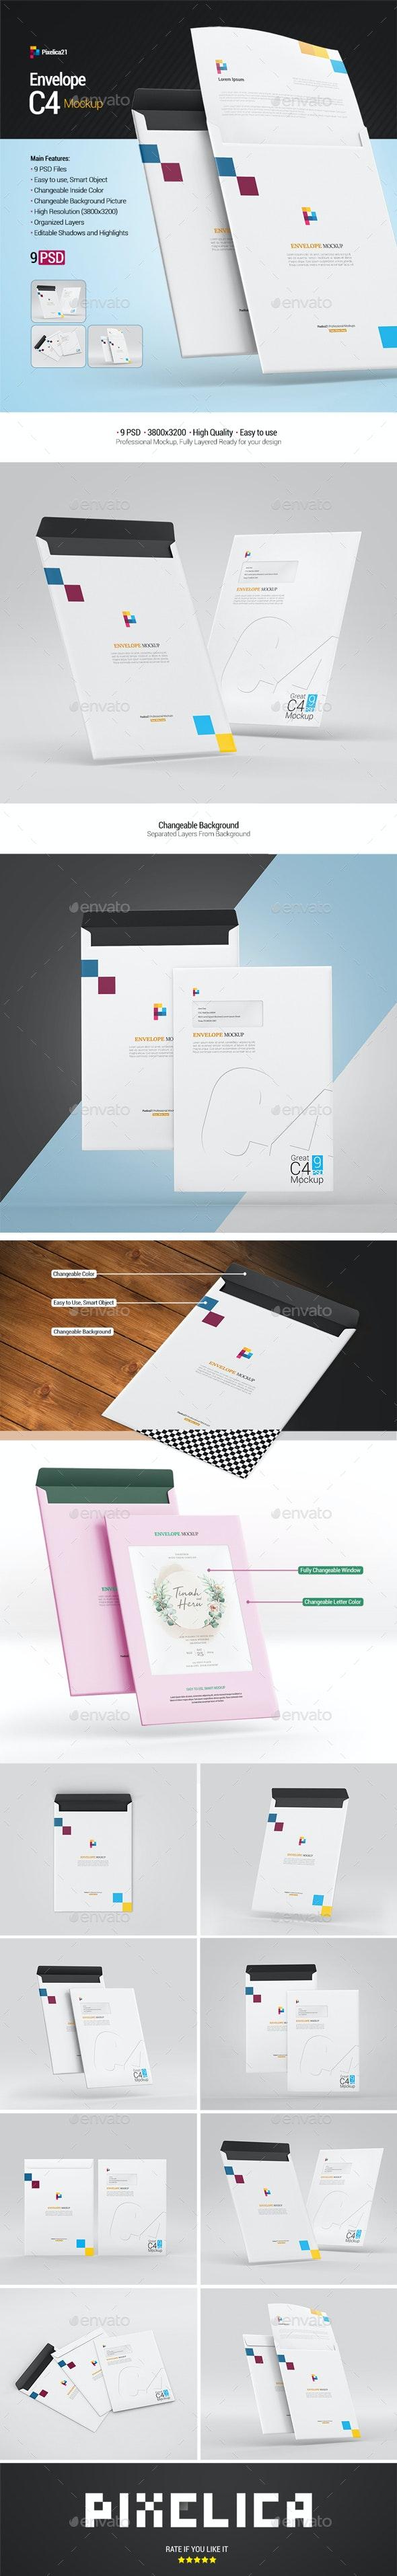 Envelope C4 Mockup - Product Mock-Ups Graphics